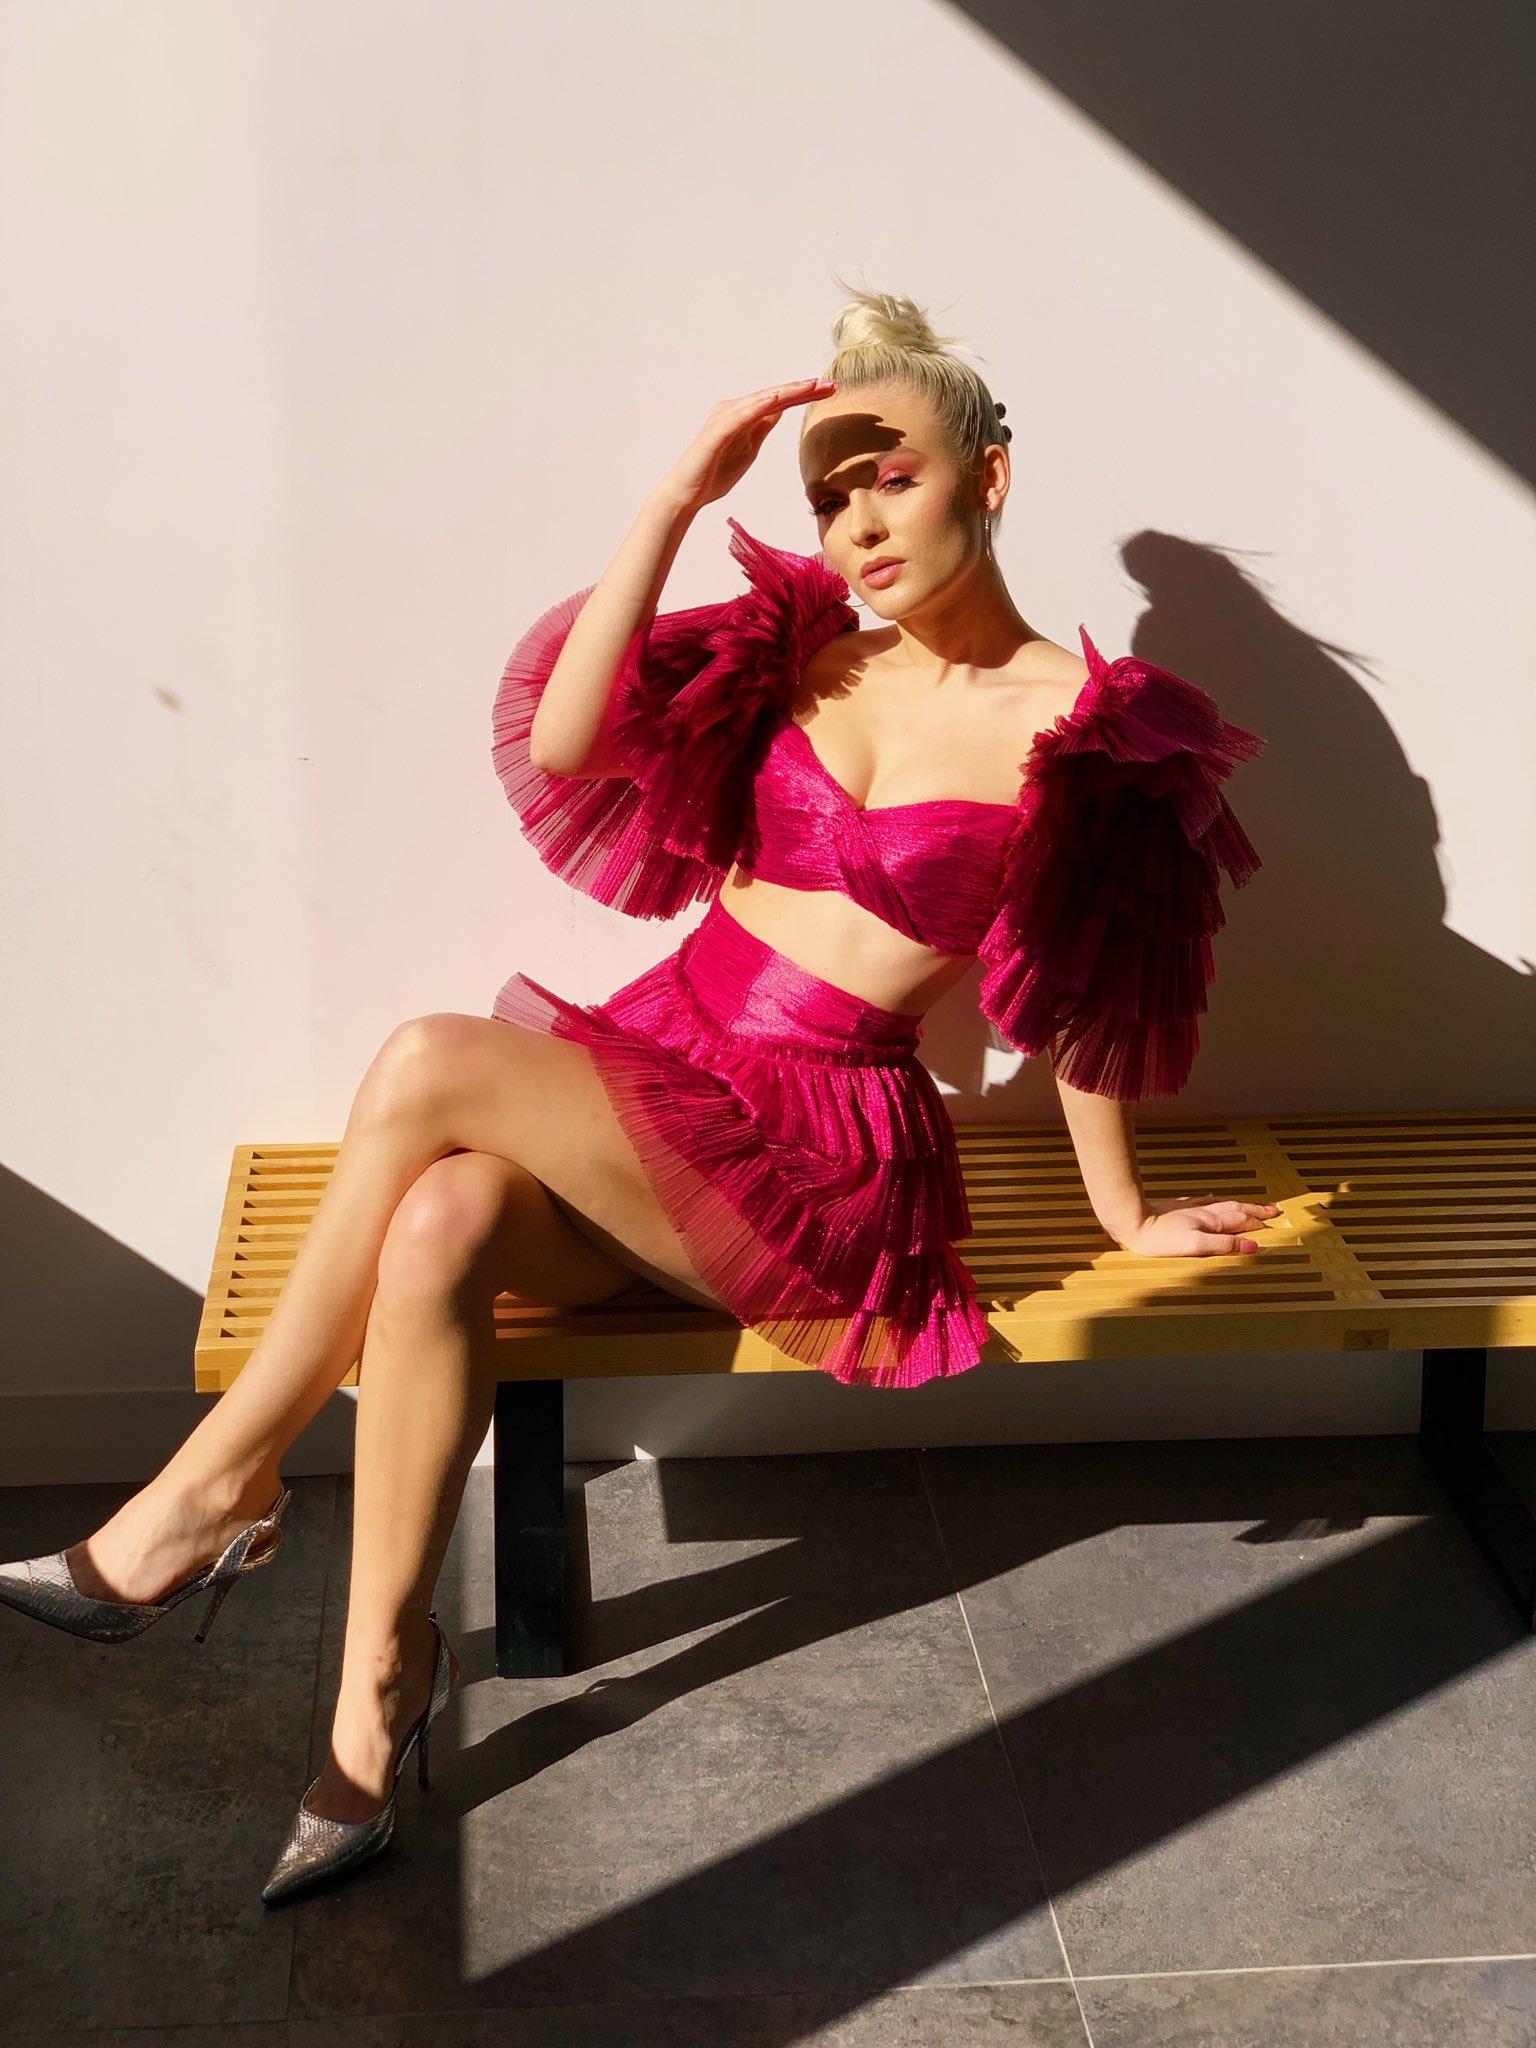 Zara Larsson awesome pics